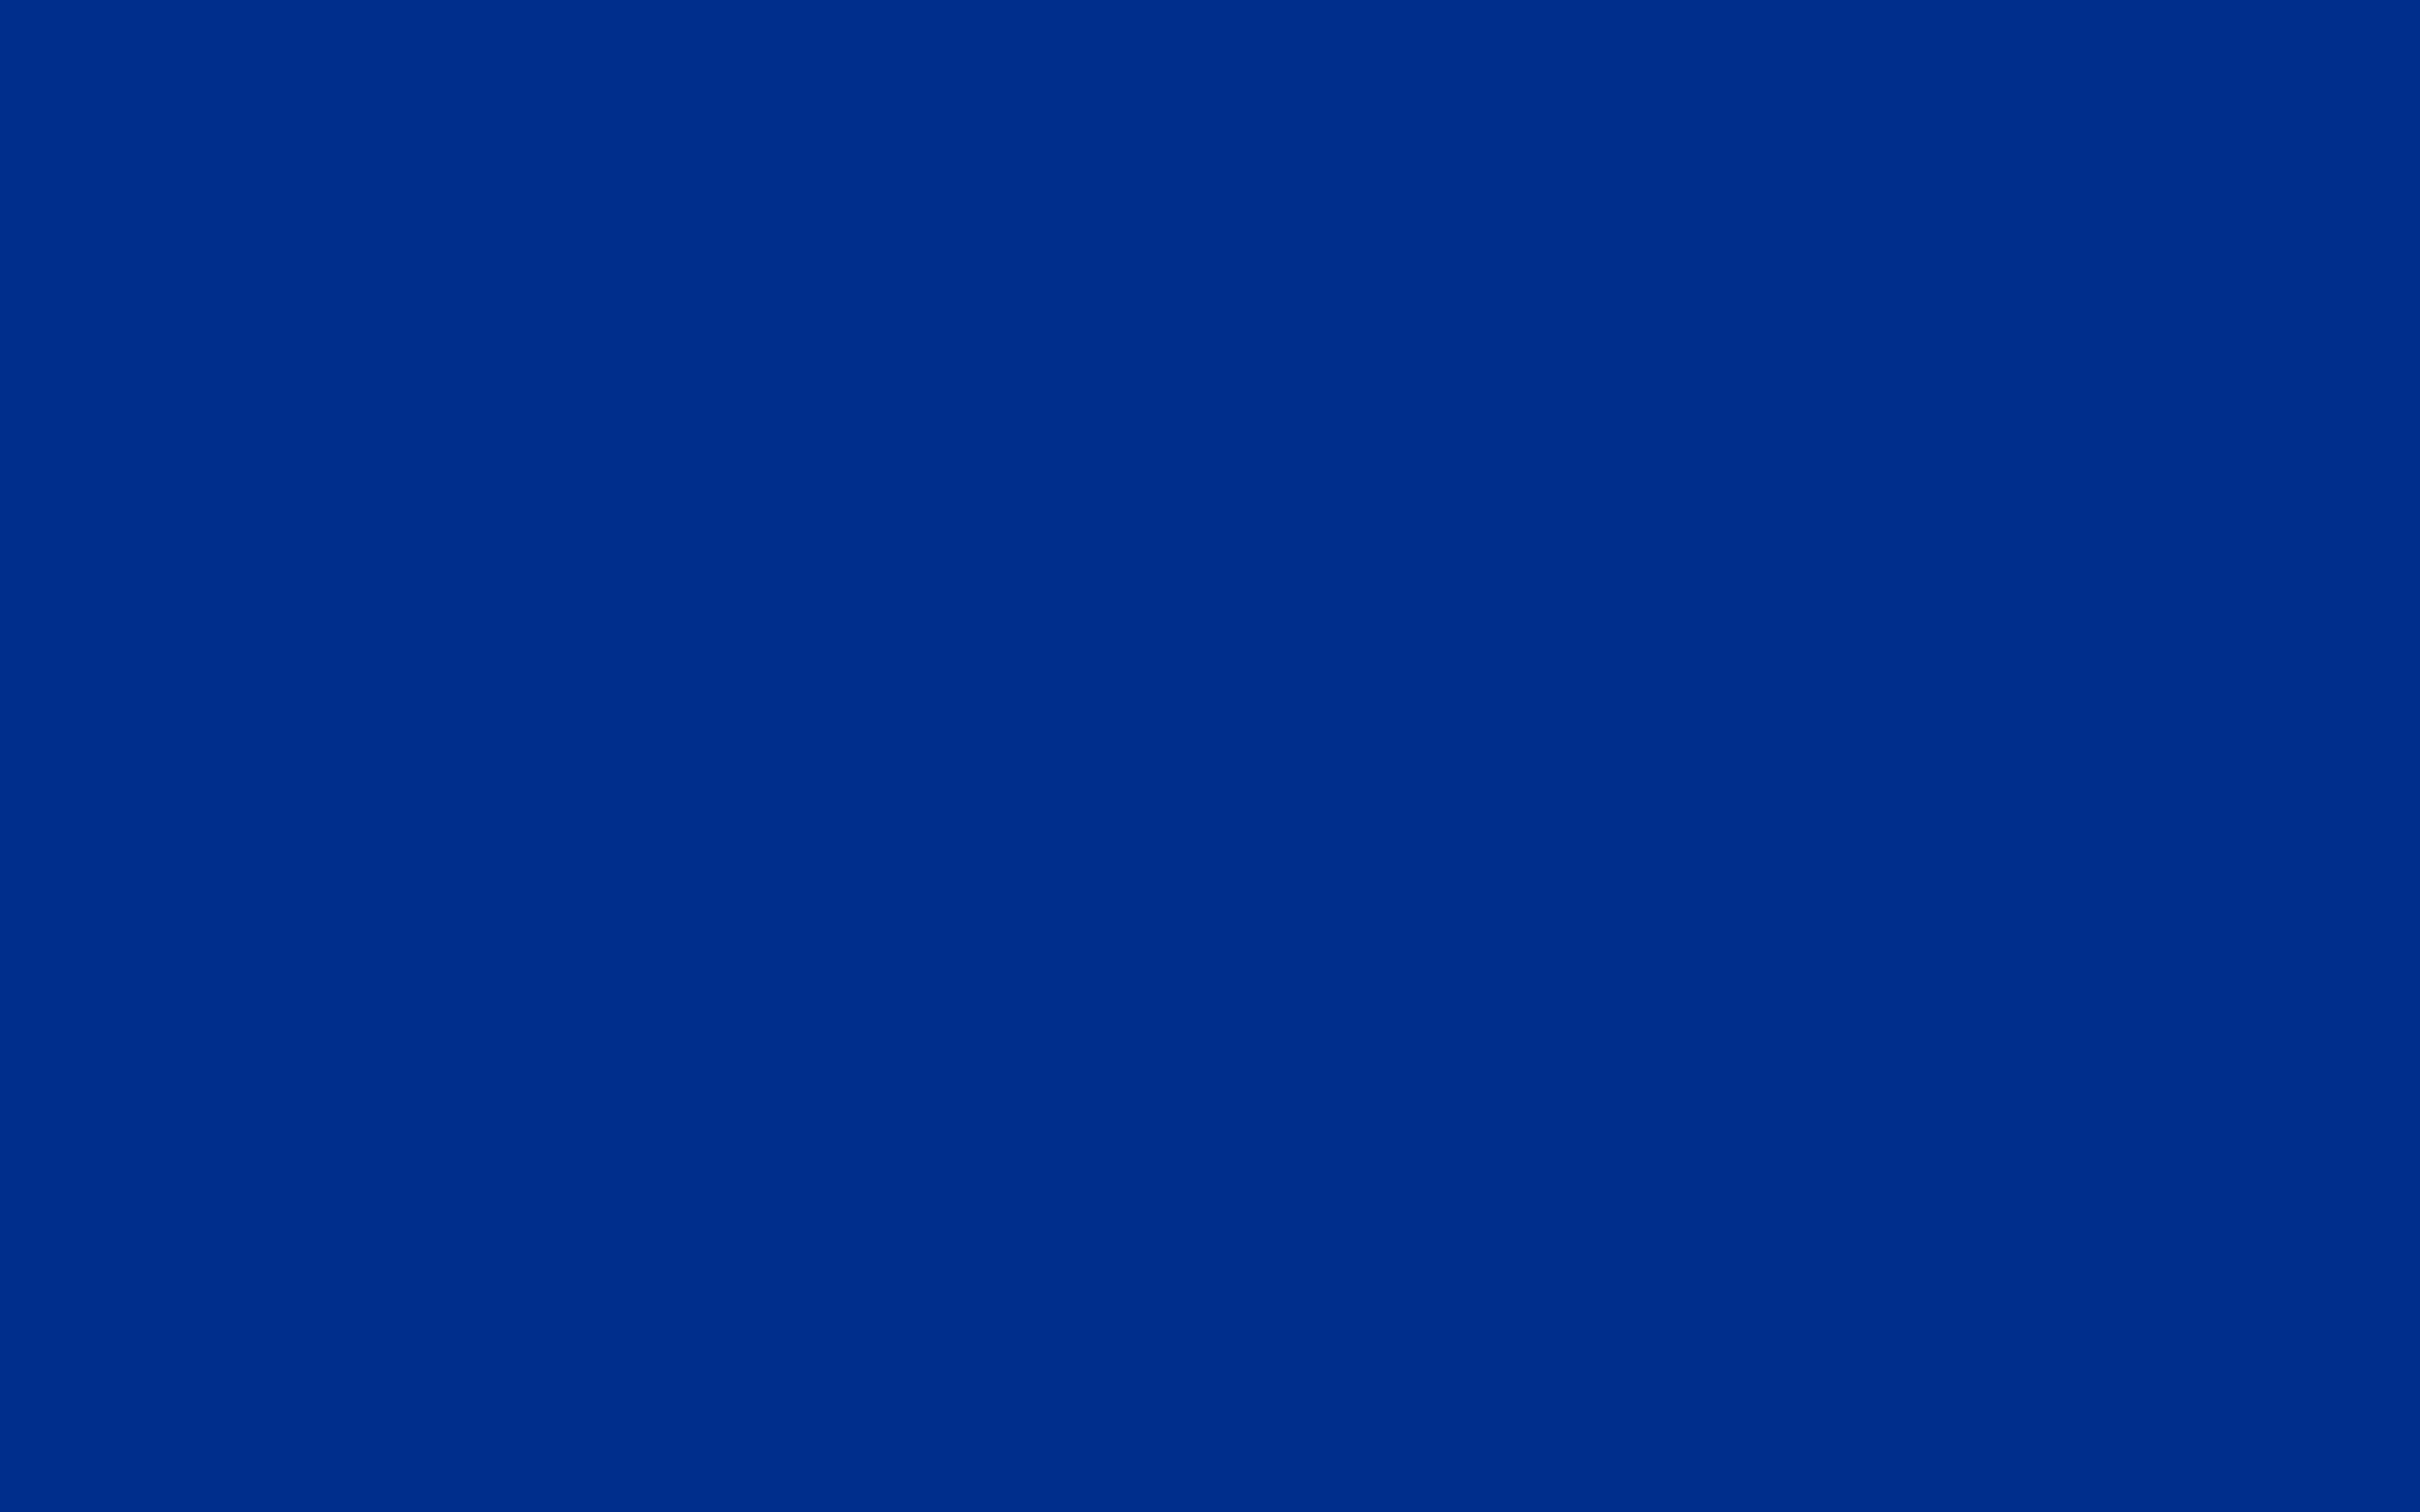 Solid Royal Blue Background 2560x1600 air force dark blue 2560x1600